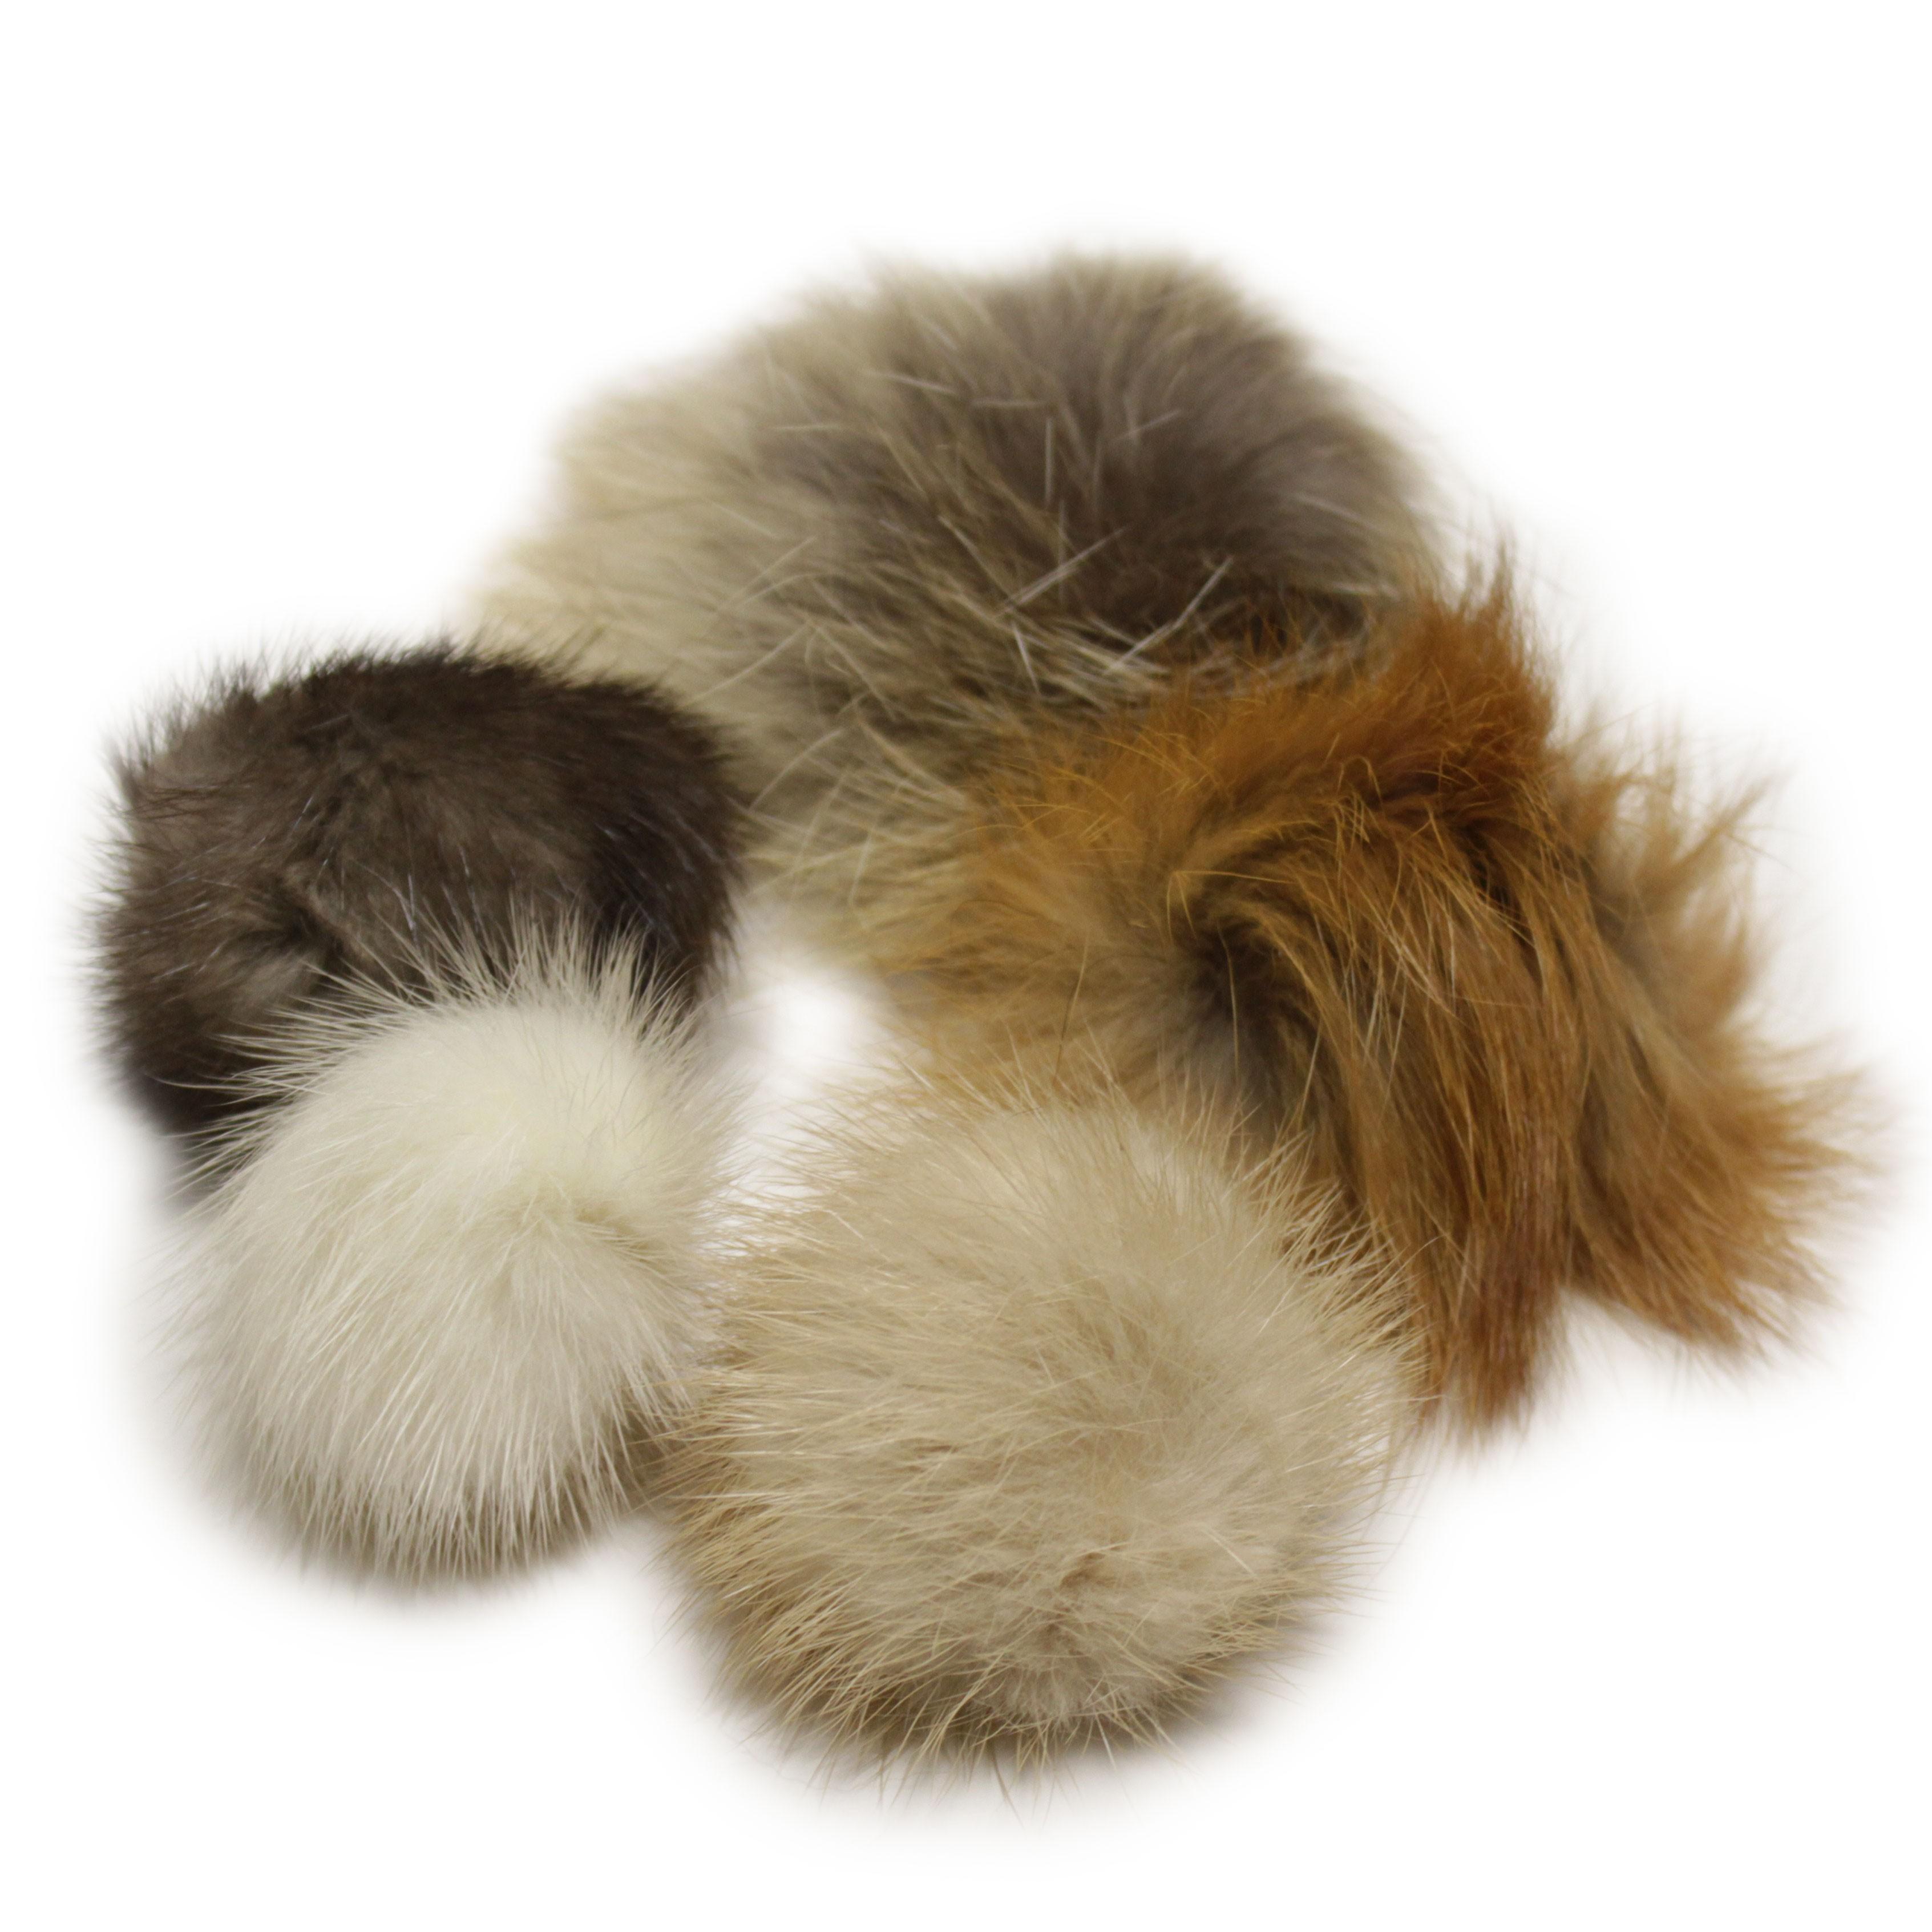 "5-pack Lana's 1.5""-2.5"" Real Fur Pom-Poms - Mink, Coyote, Fox Fur"